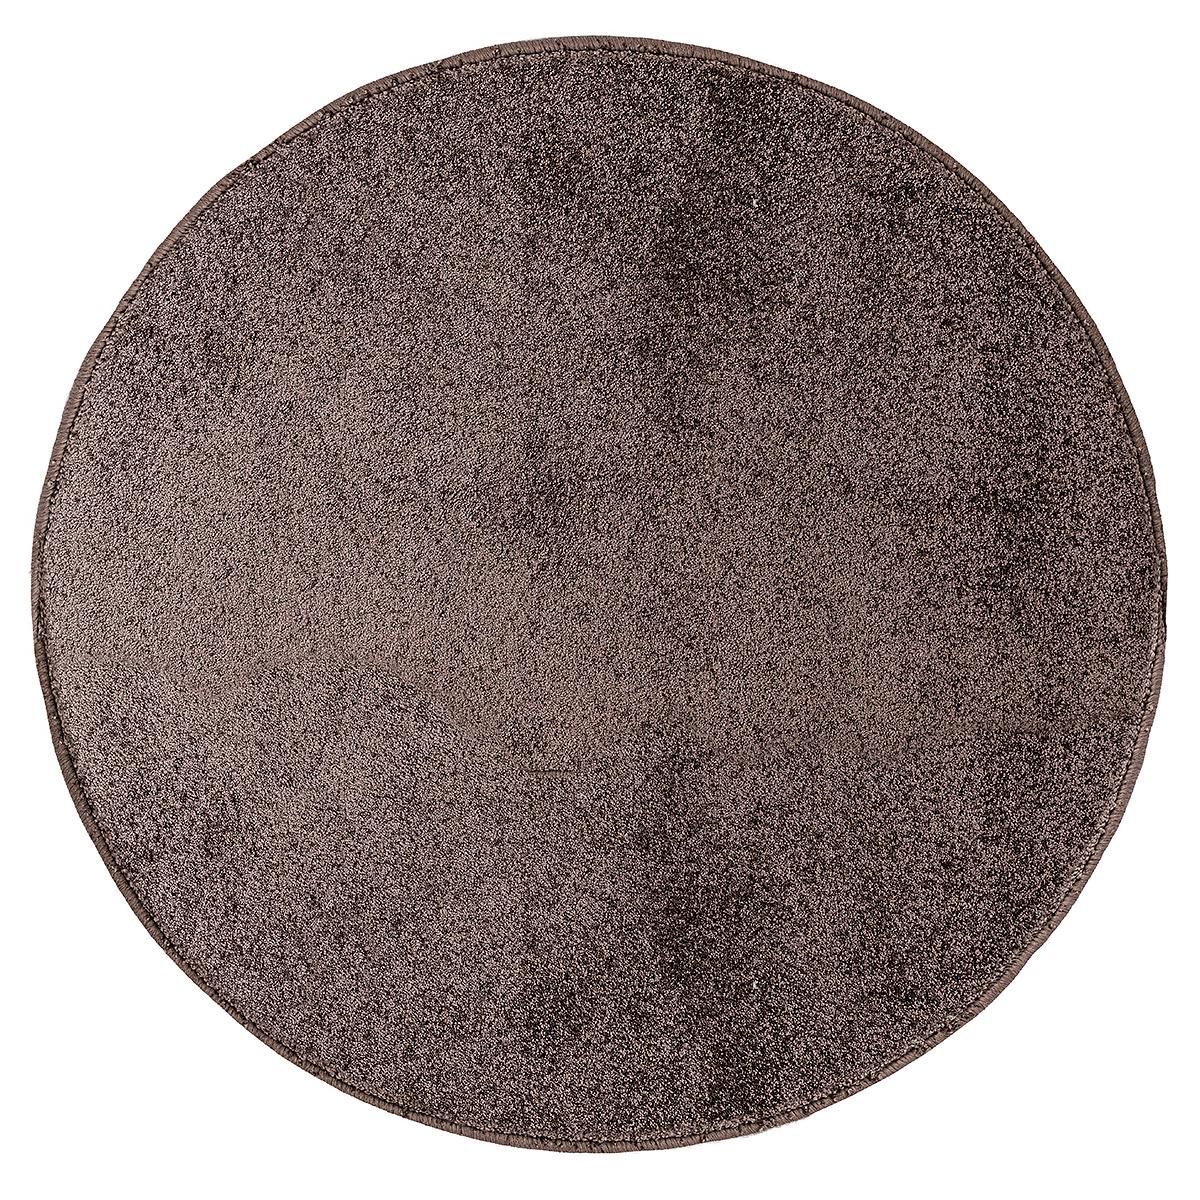 Vopi Kusový koberec Capri hnedá, 80 cm